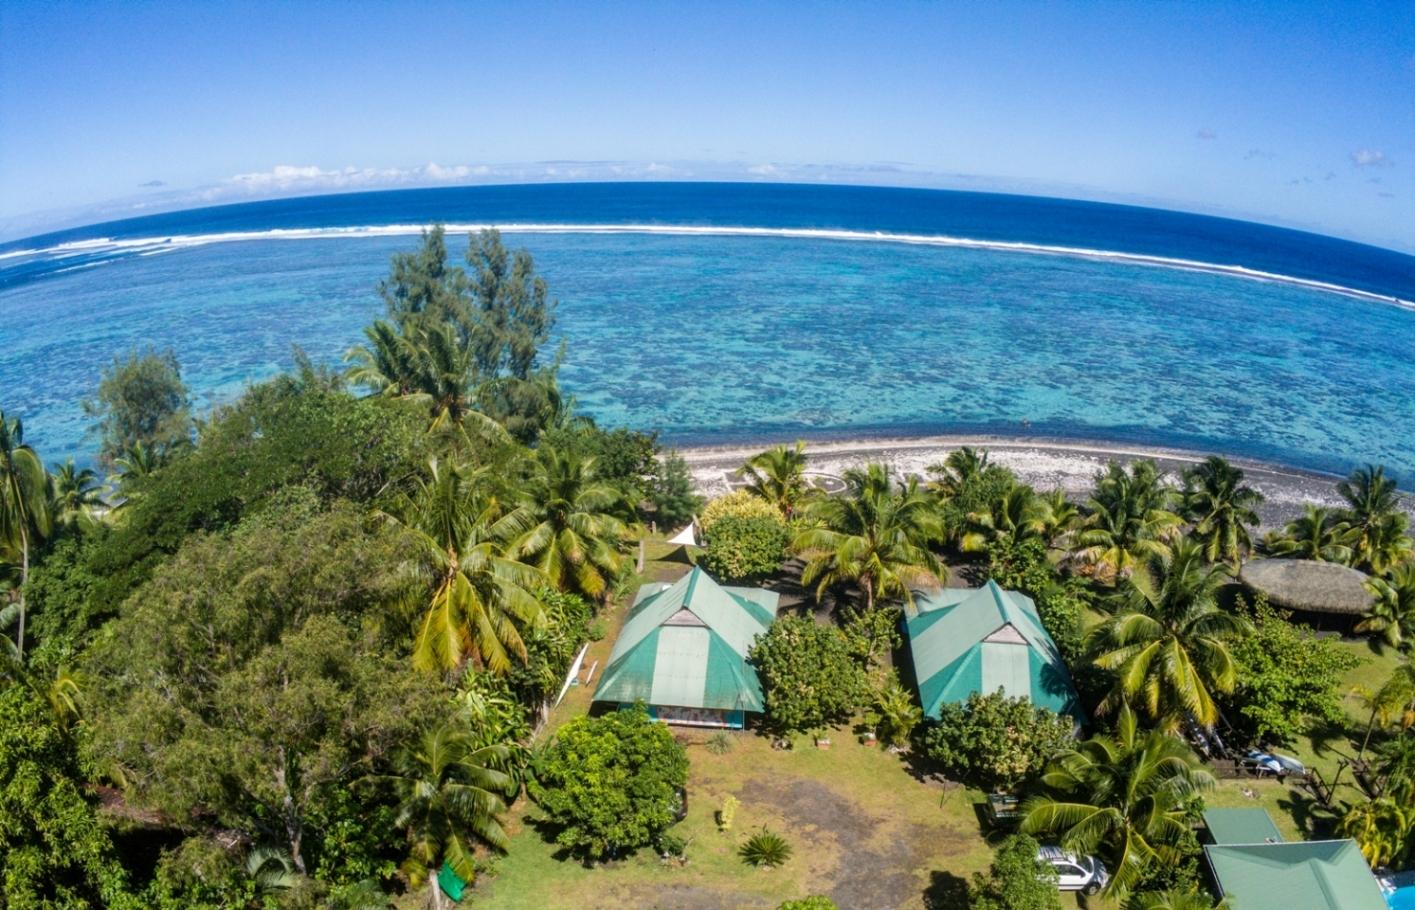 https://tahititourisme.ch/wp-content/uploads/2019/08/copie-Tahiti-tourisme-948ko.jpg